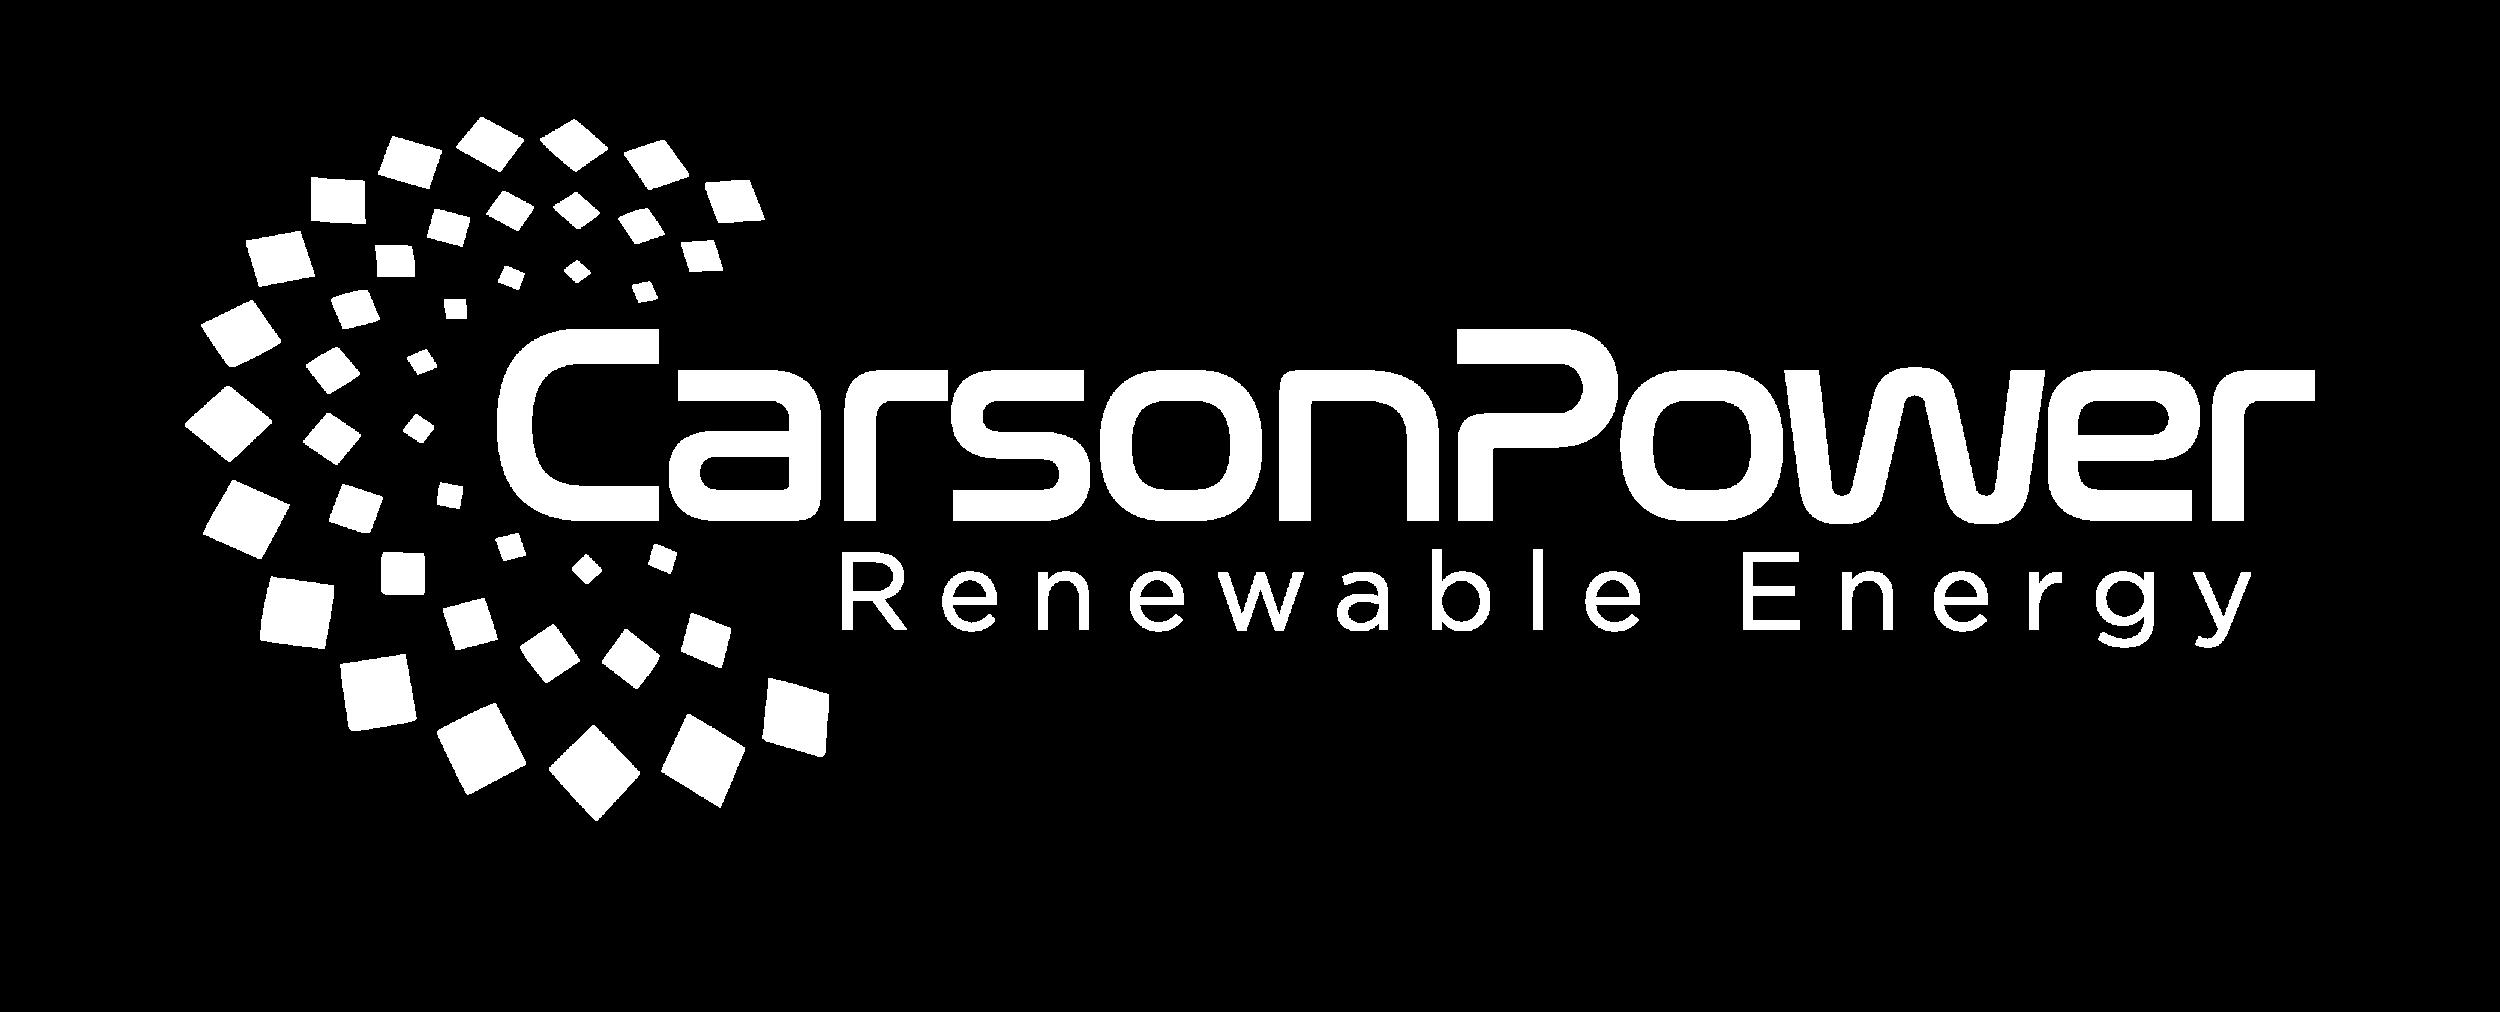 Carson Power